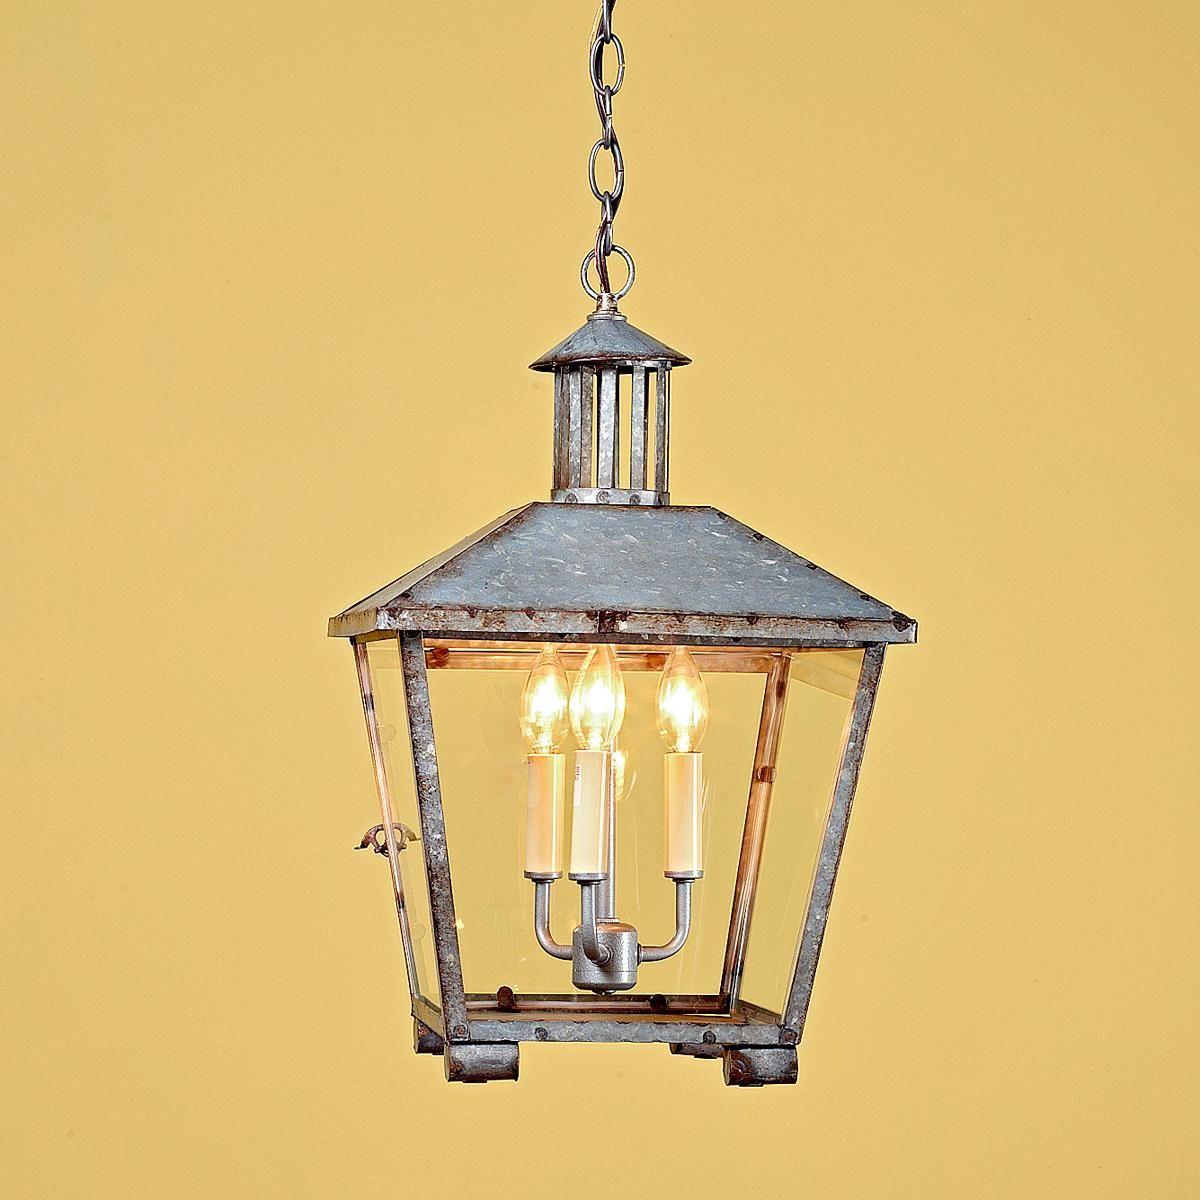 Rustic galvanized lantern welcome home lantern light fixture